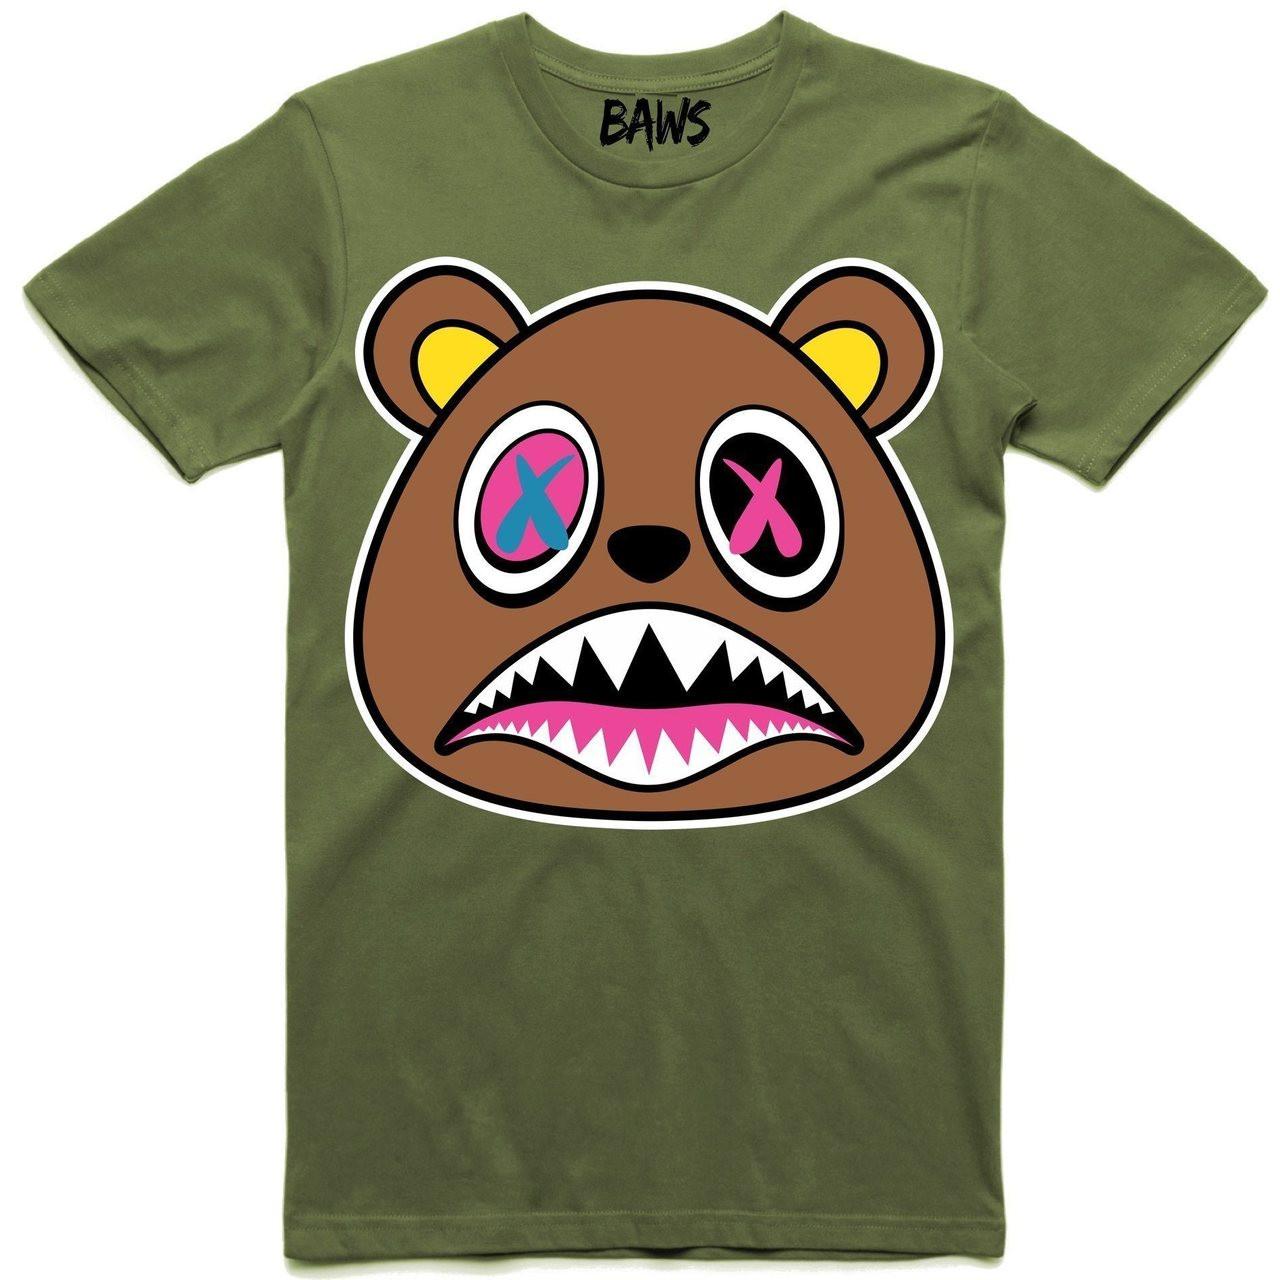 f6b05fc6c07 BAWS Clothing. $40.44. BAWS OG Bear Olive Tee